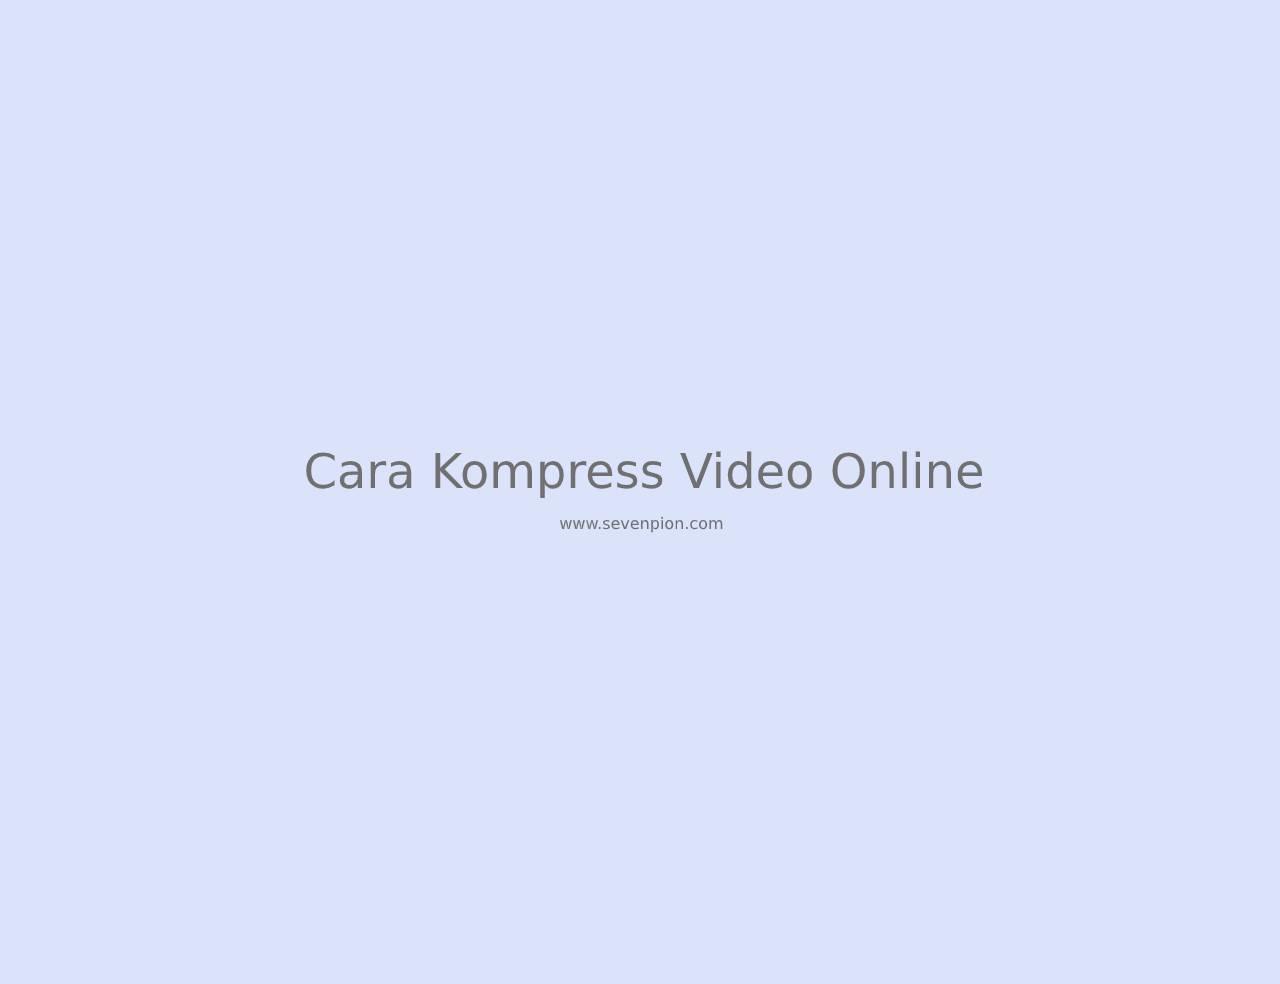 cara kompress video online